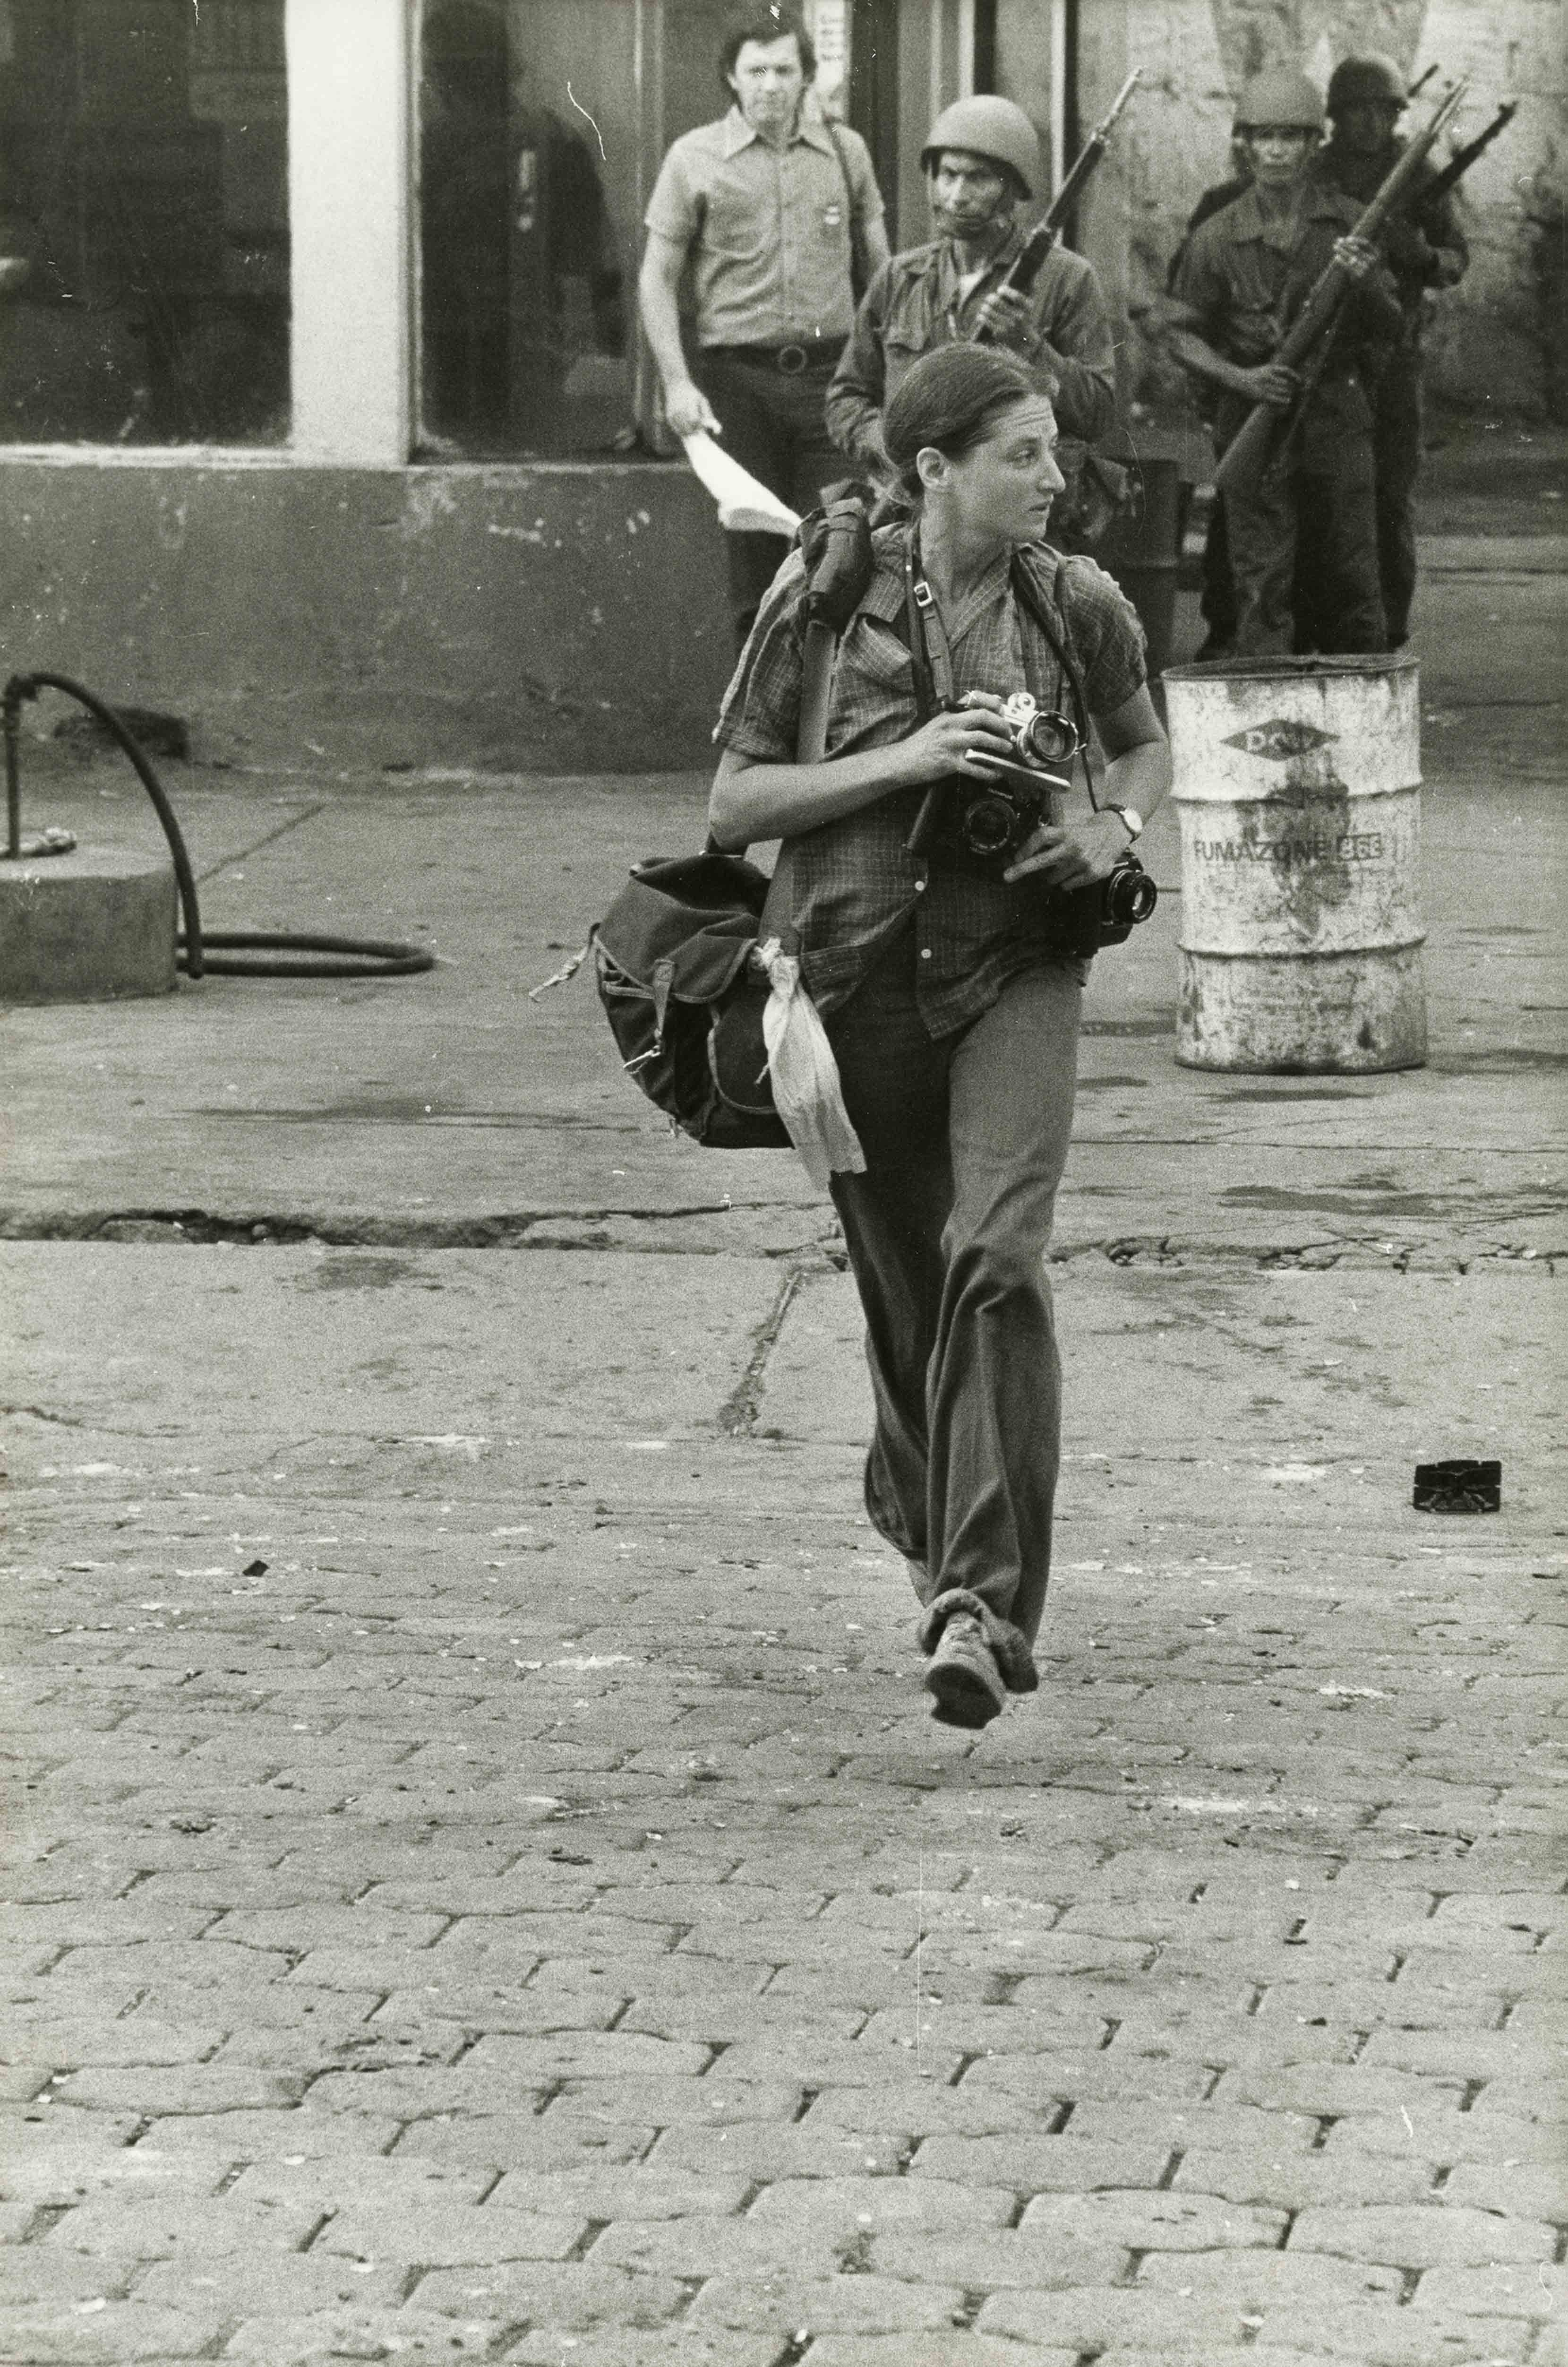 Portrait de Susan Meiselas, Monimbo, Nicaragua, septembre 1978 © Alain Dejean Sygma